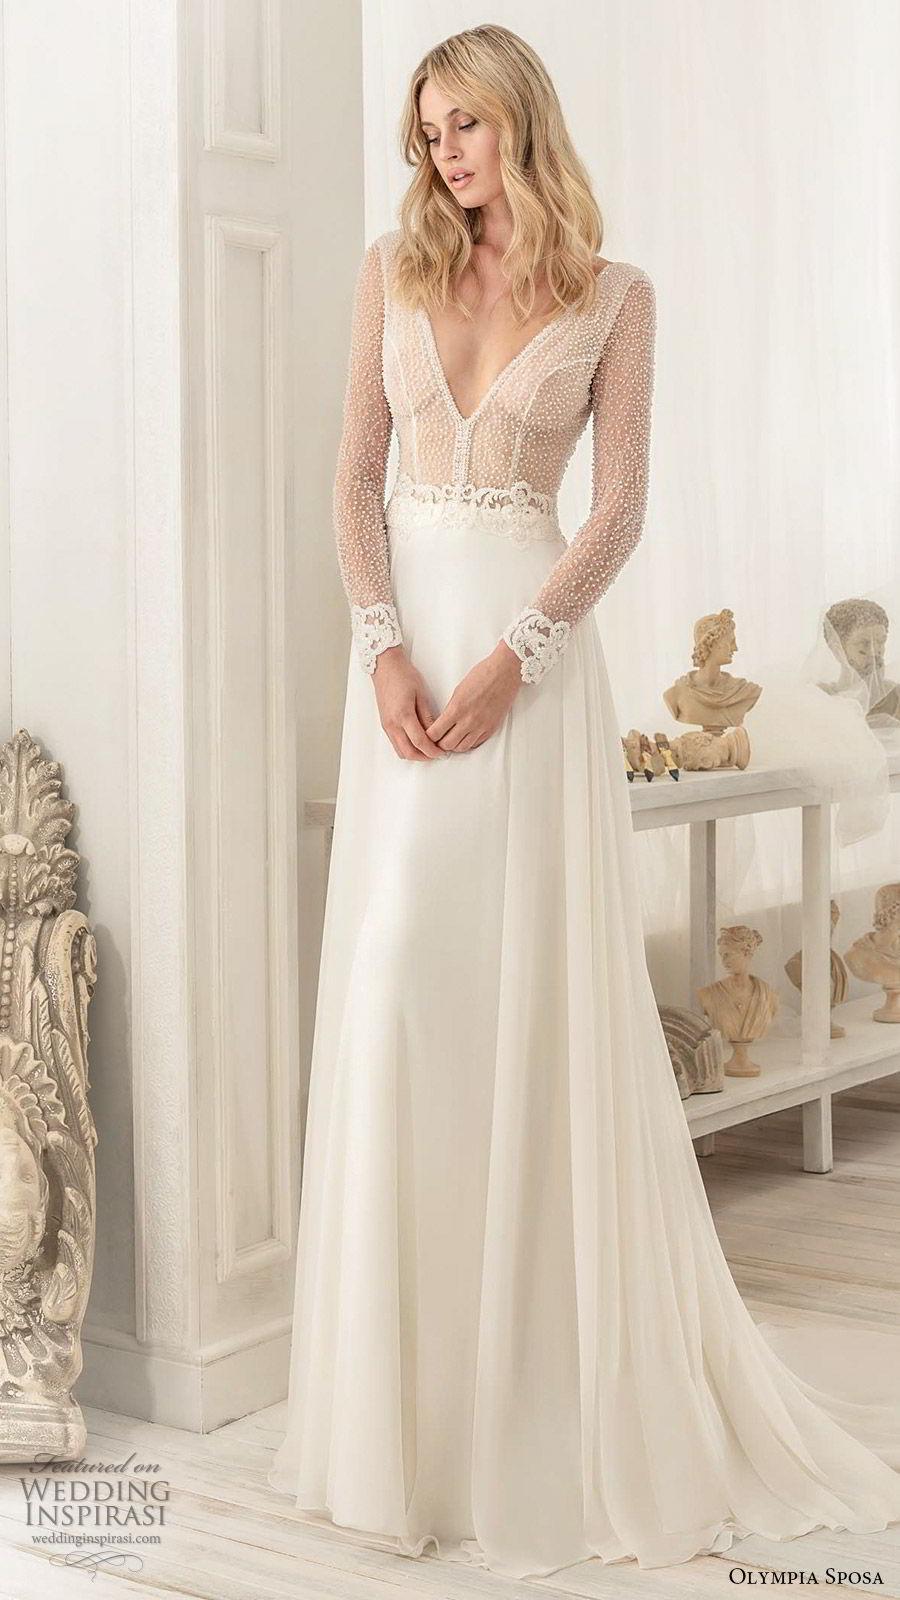 olympia sposa 2020 bridal illusion long sleeves deep v neckline sheer embellished bodice a line ball gown wedding dress (8) elegant modern sexy chapel train mv